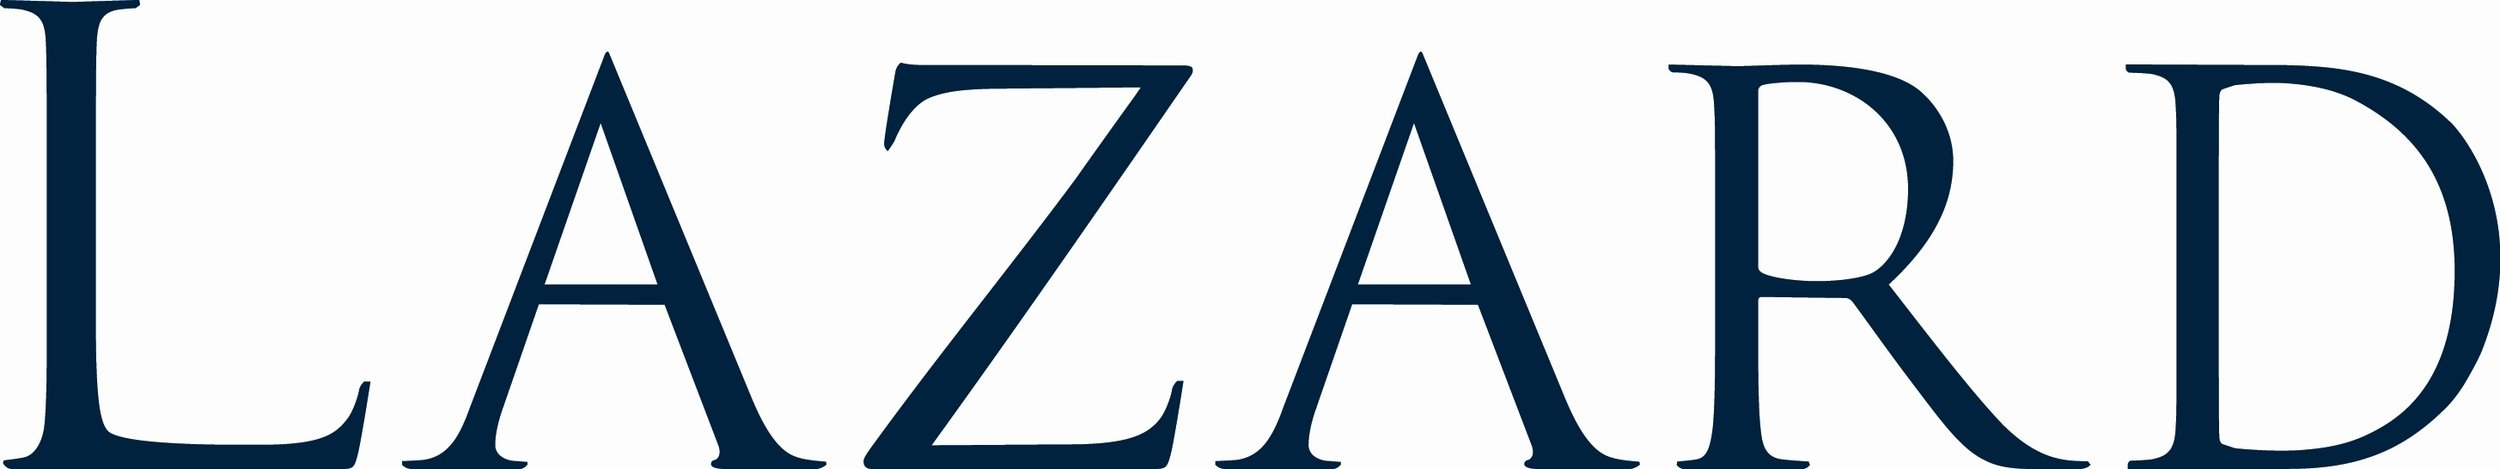 Lazard_Corporate_Blue.jpg